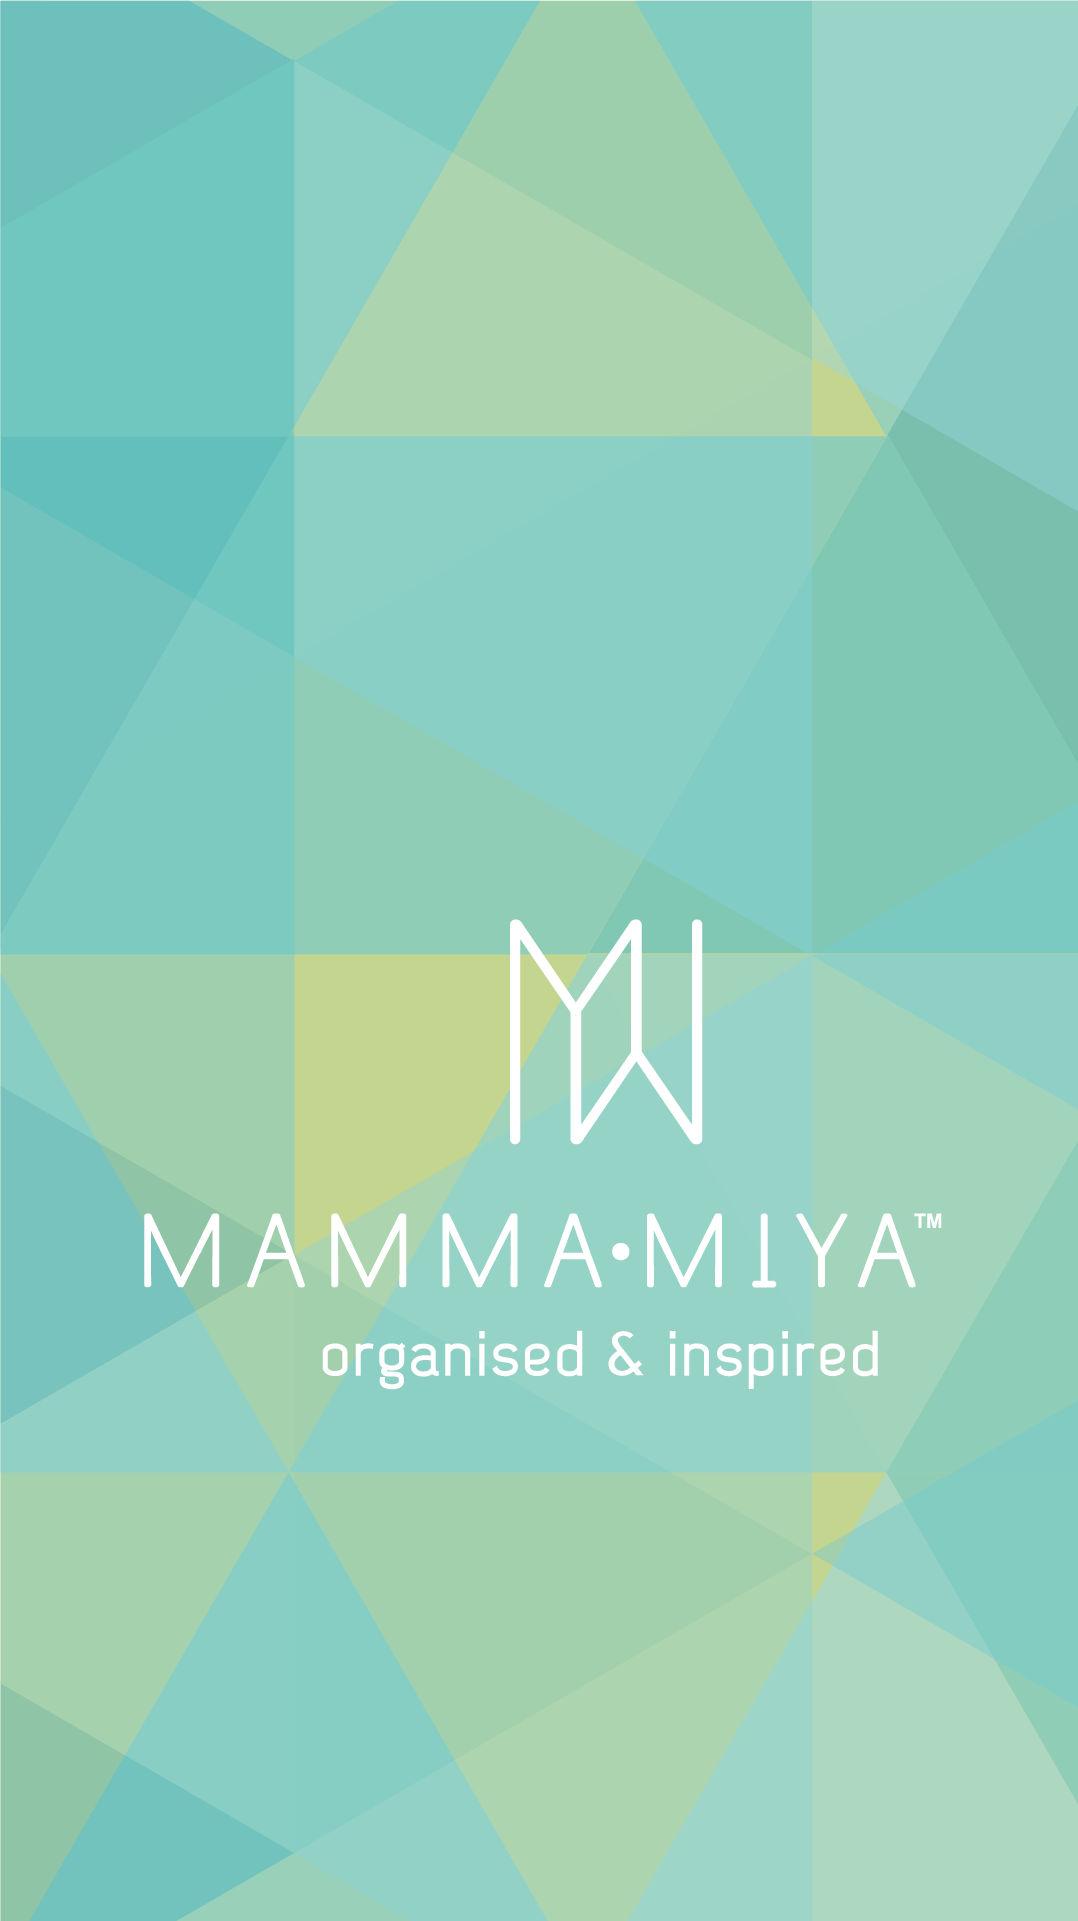 Mamma-Miya - Jobs For Women